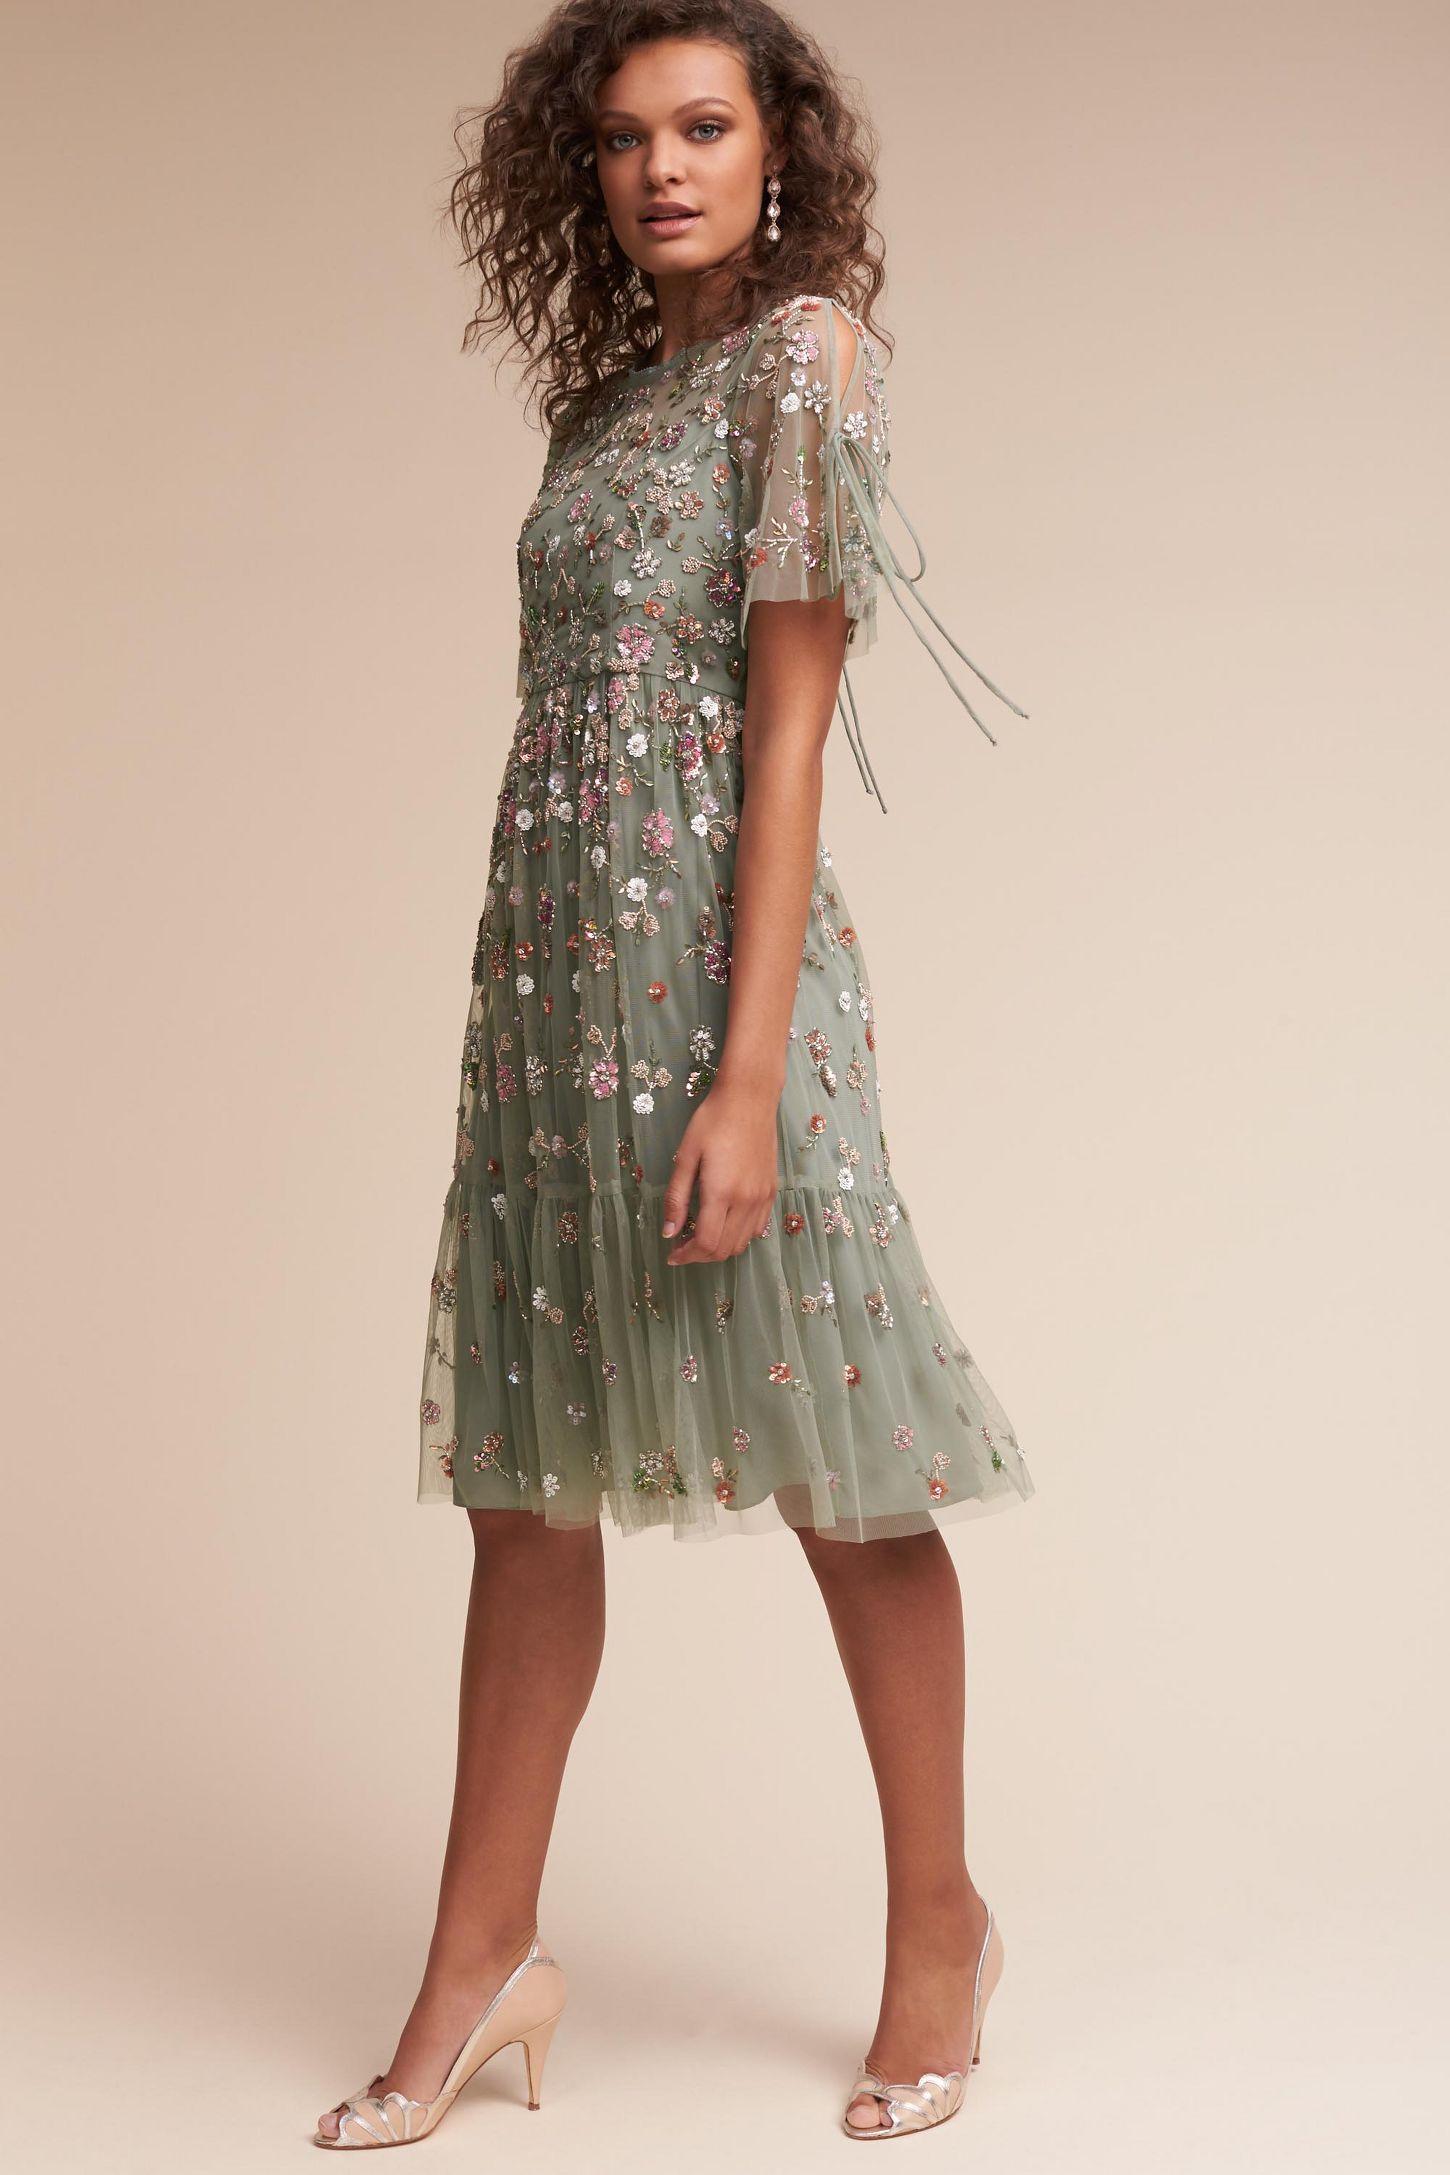 Best 25+ Wedding guest dresses ideas on Pinterest | Christmas ...